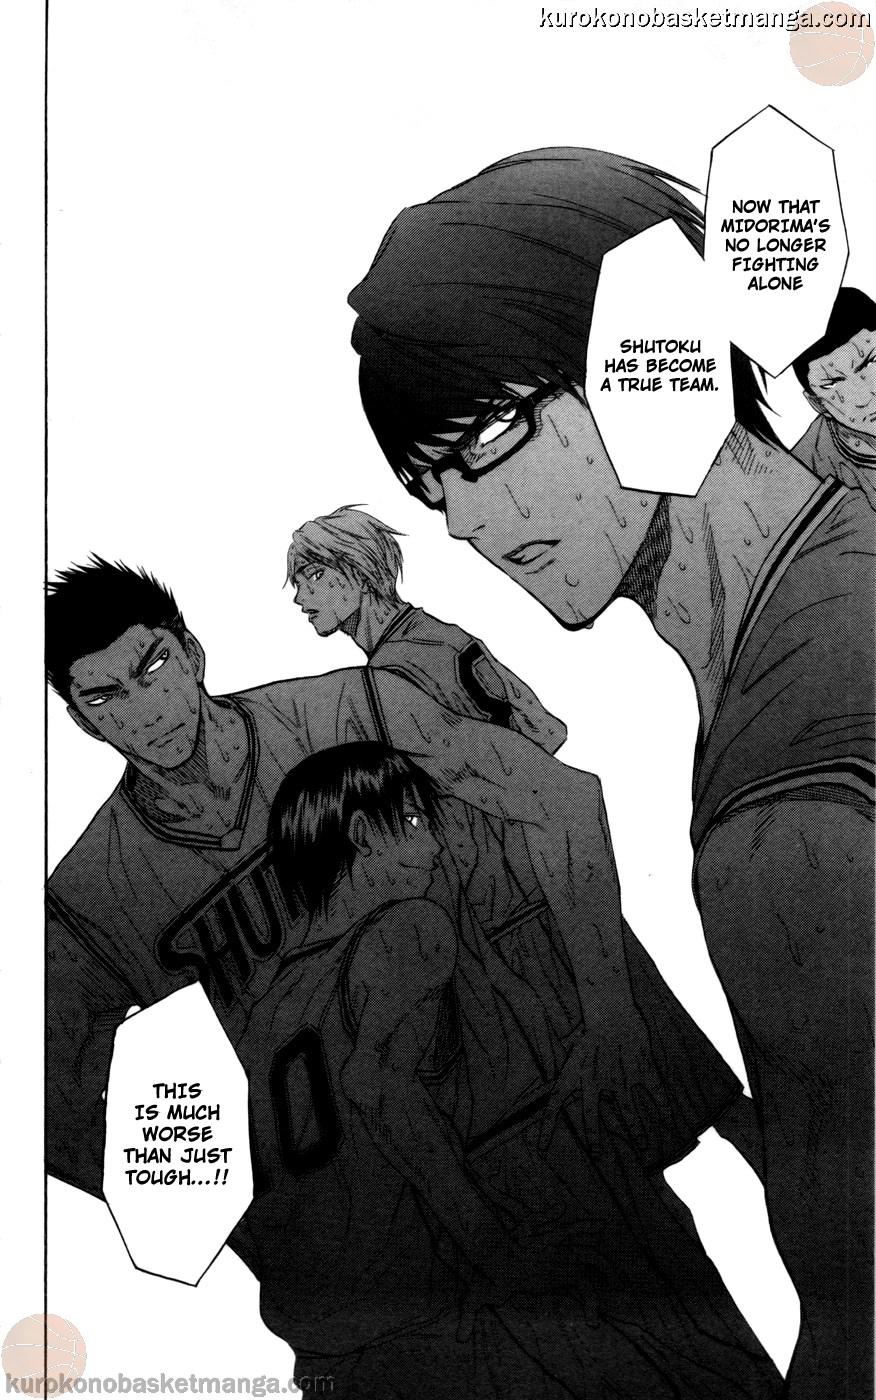 Kuroko no Basket Manga Chapter 87 - Image 22